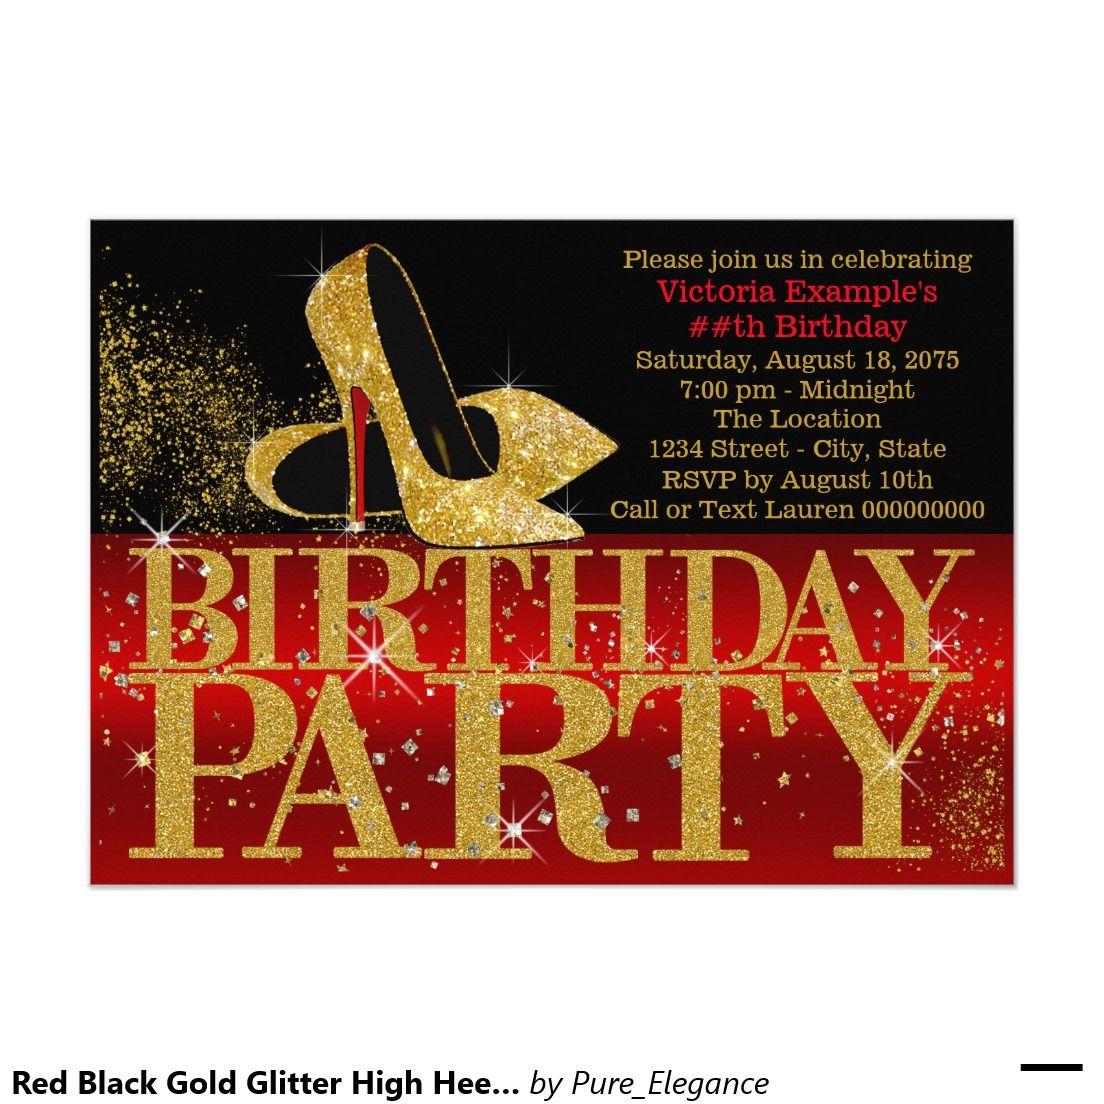 Red Black Gold Glitter High Heel Birthday Party Invitation | High ...